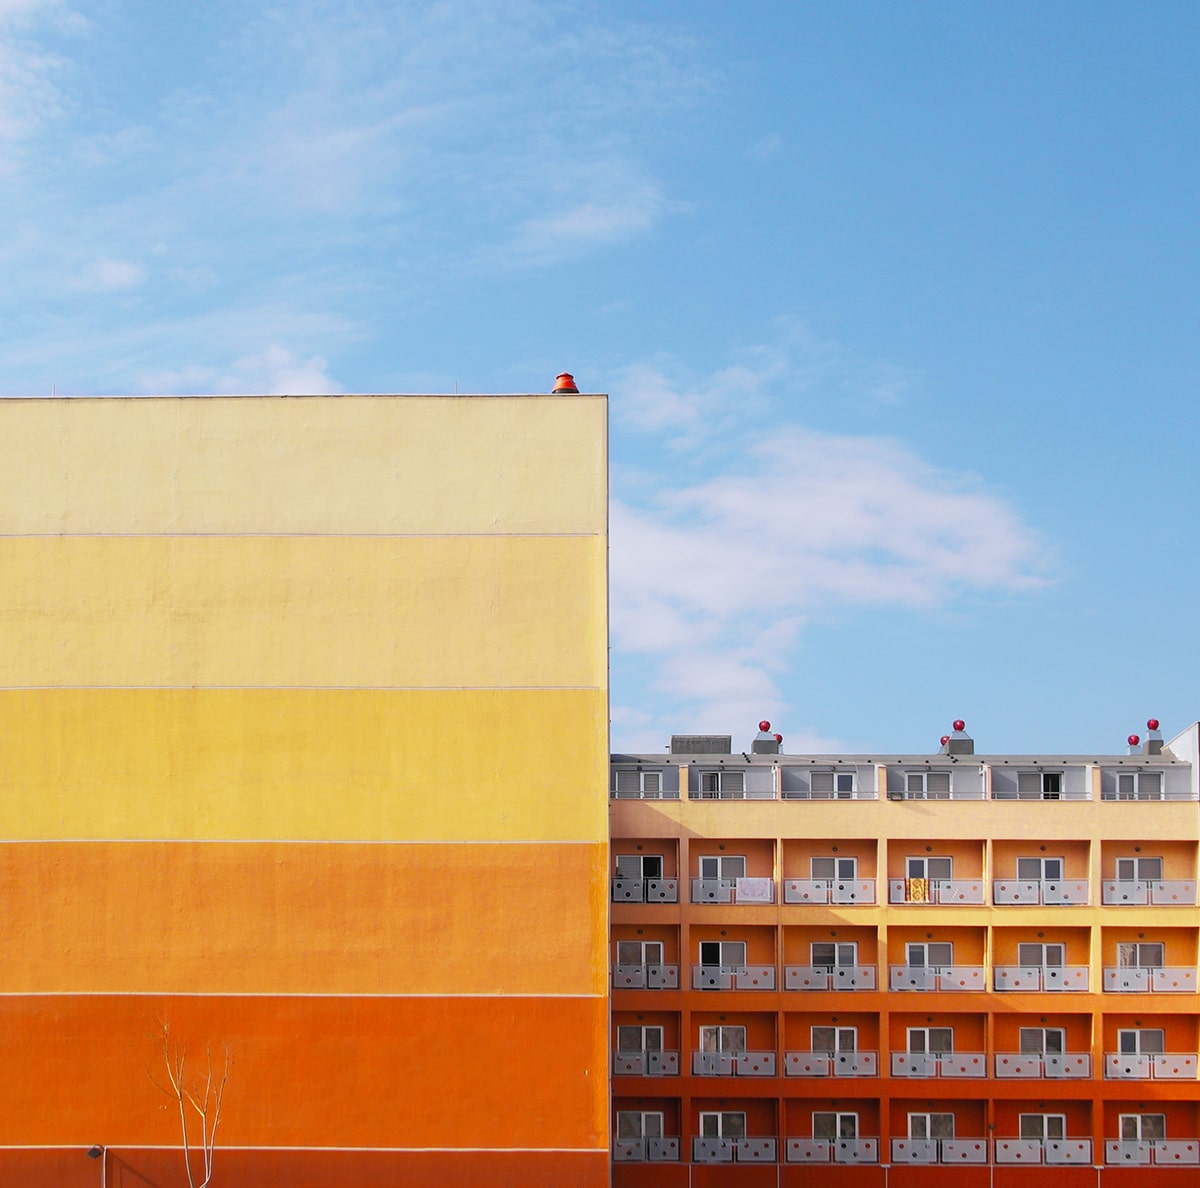 Cityscape Photography by Yener Torun